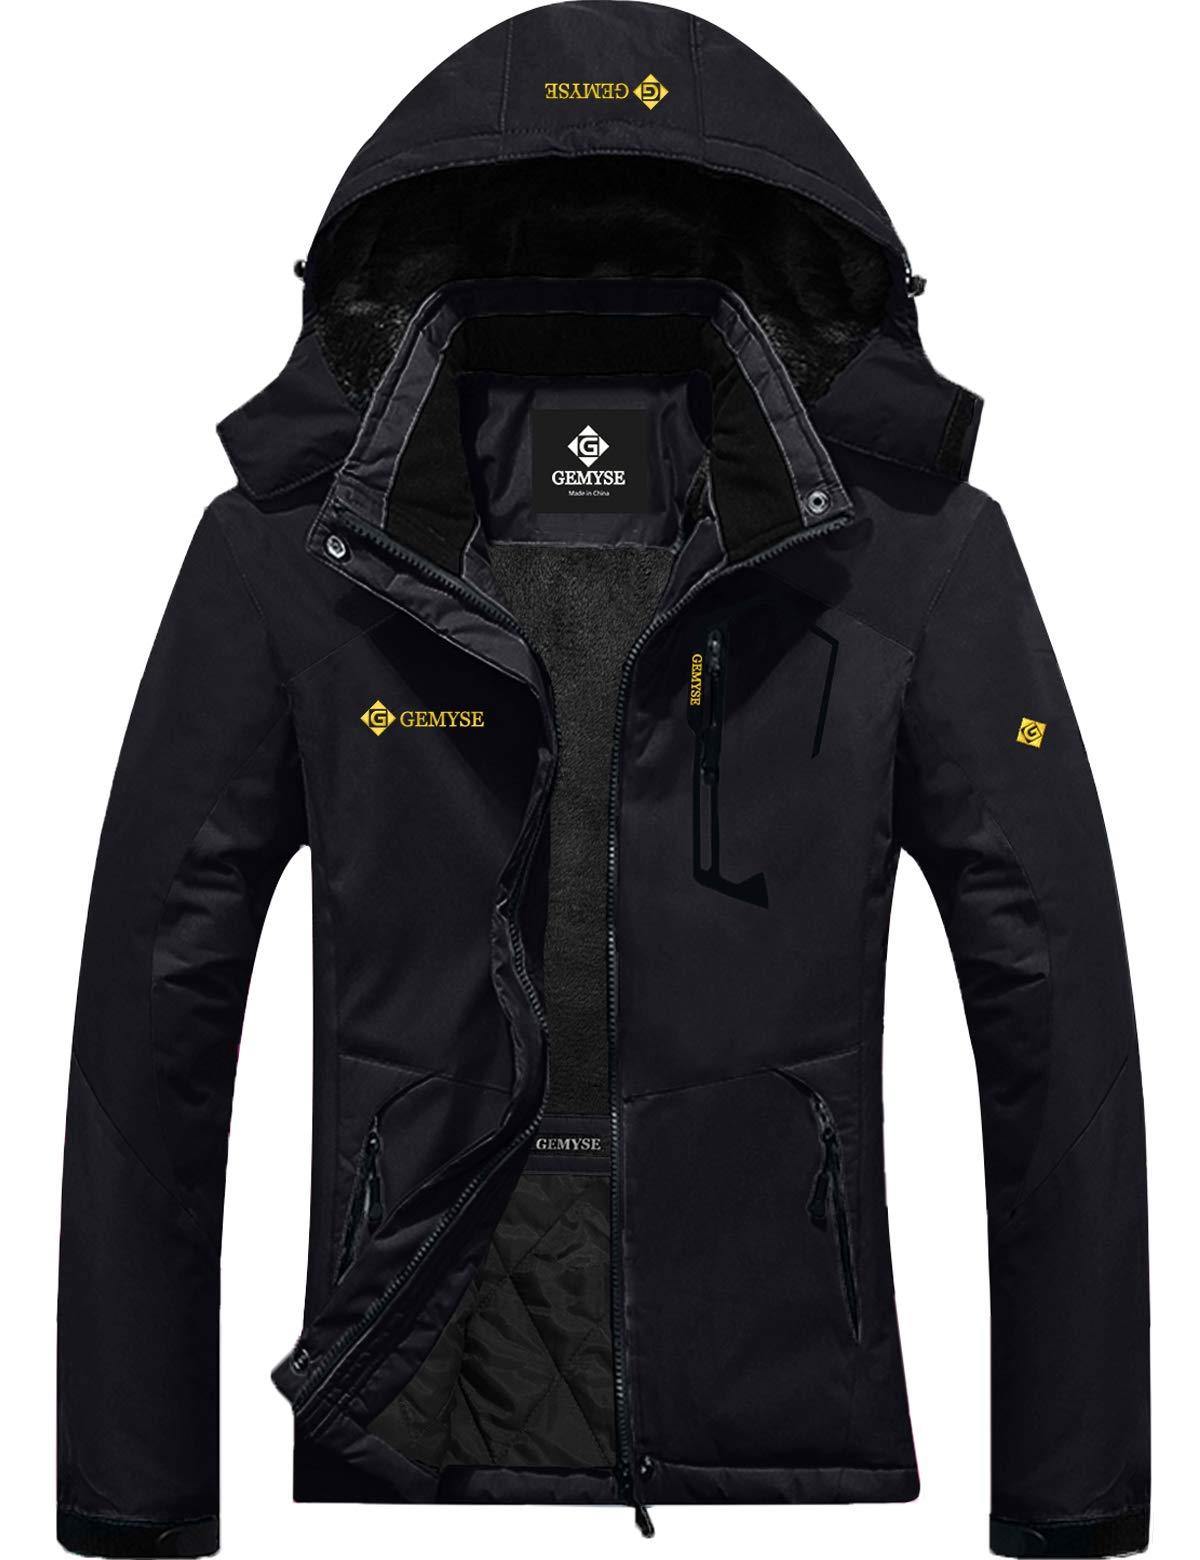 GEMYSE Women's Mountain Waterproof Ski Snow Jacket Winter Windproof Rain Jacket (Black, S) by GEMYSE